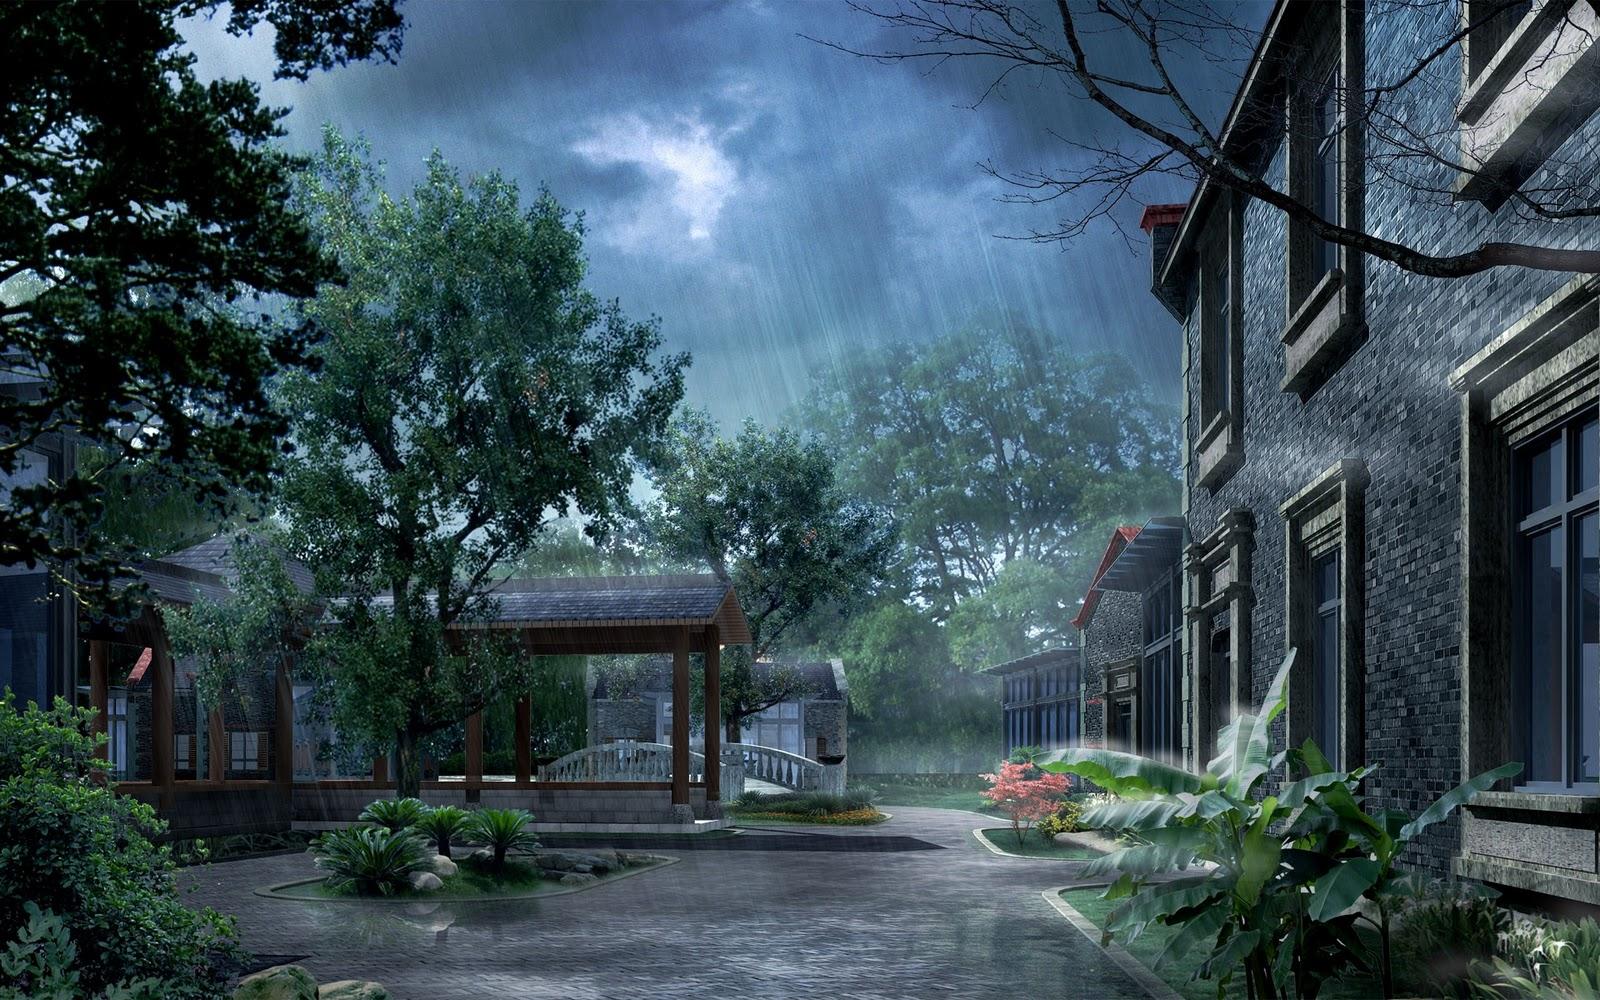 http://3.bp.blogspot.com/-cgMk0wiyaKE/TnUkwwd6s2I/AAAAAAAABec/sQqfasSpi5Y/s1600/digital+nature+wallpaper+3.jpg